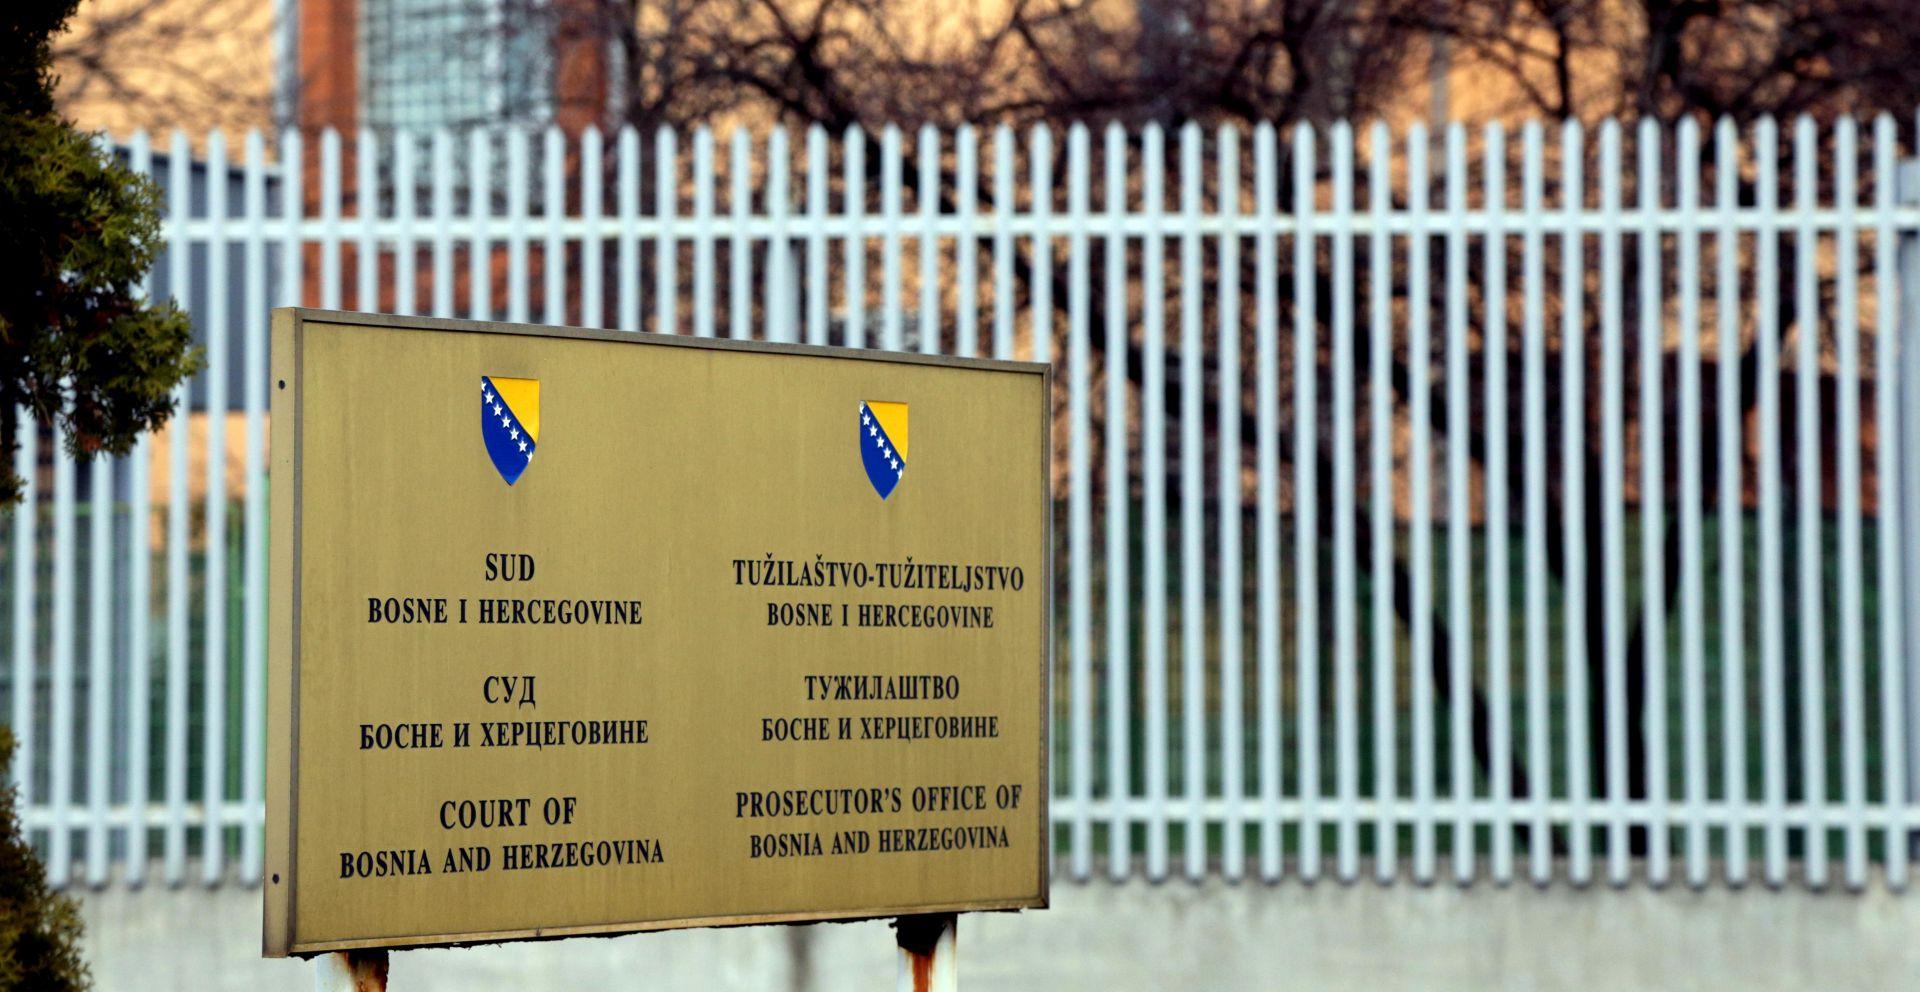 TUŽITELJSTVO BiH: Podignute optužnice za ratni zločin na području Orašja